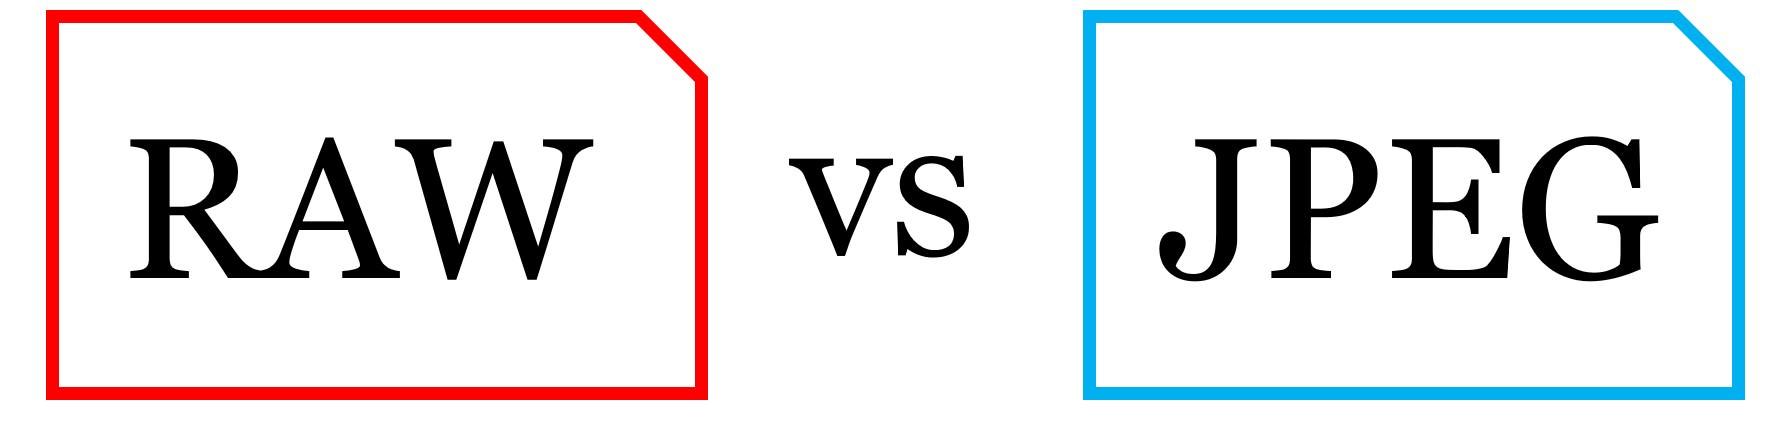 %e4%b8%80%e7%9c%bc%e3%83%ac%e3%83%95%e3%82%92%e8%b2%b7%e3%81%a3%e3%81%9f%e3%82%89%e5%88%9d%e3%82%81%e3%81%ab%e7%9f%a5%e3%81%a3%e3%81%a6%e3%81%8a%e3%81%8d%e3%81%9f%e3%81%847%e3%81%a4%e3%81%ae%e7%9f%a5